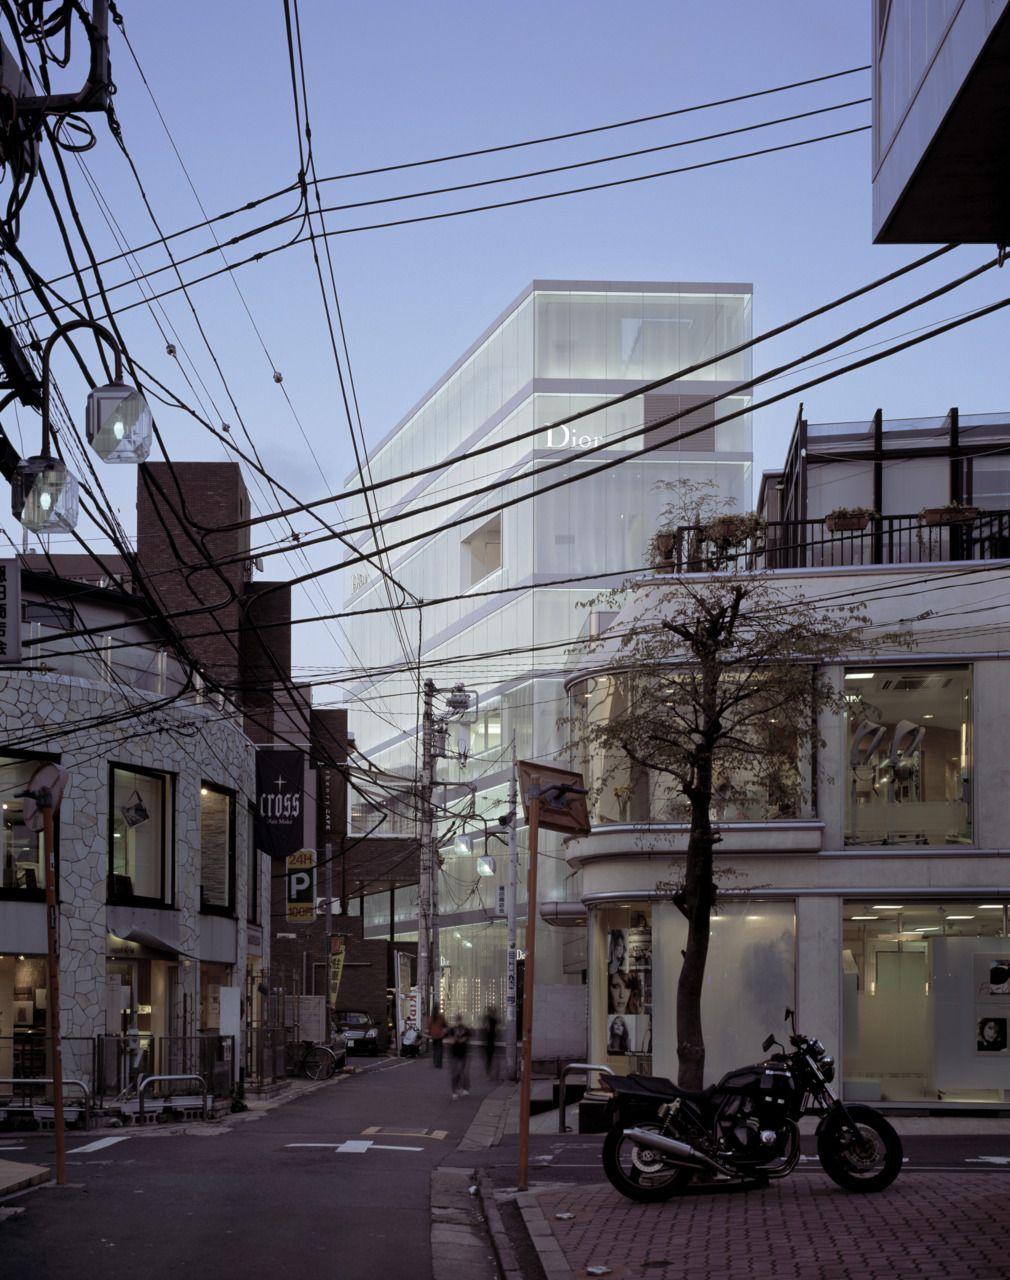 Christian dior omotesando tokyo sanaa arch box - Architektur tokyo ...